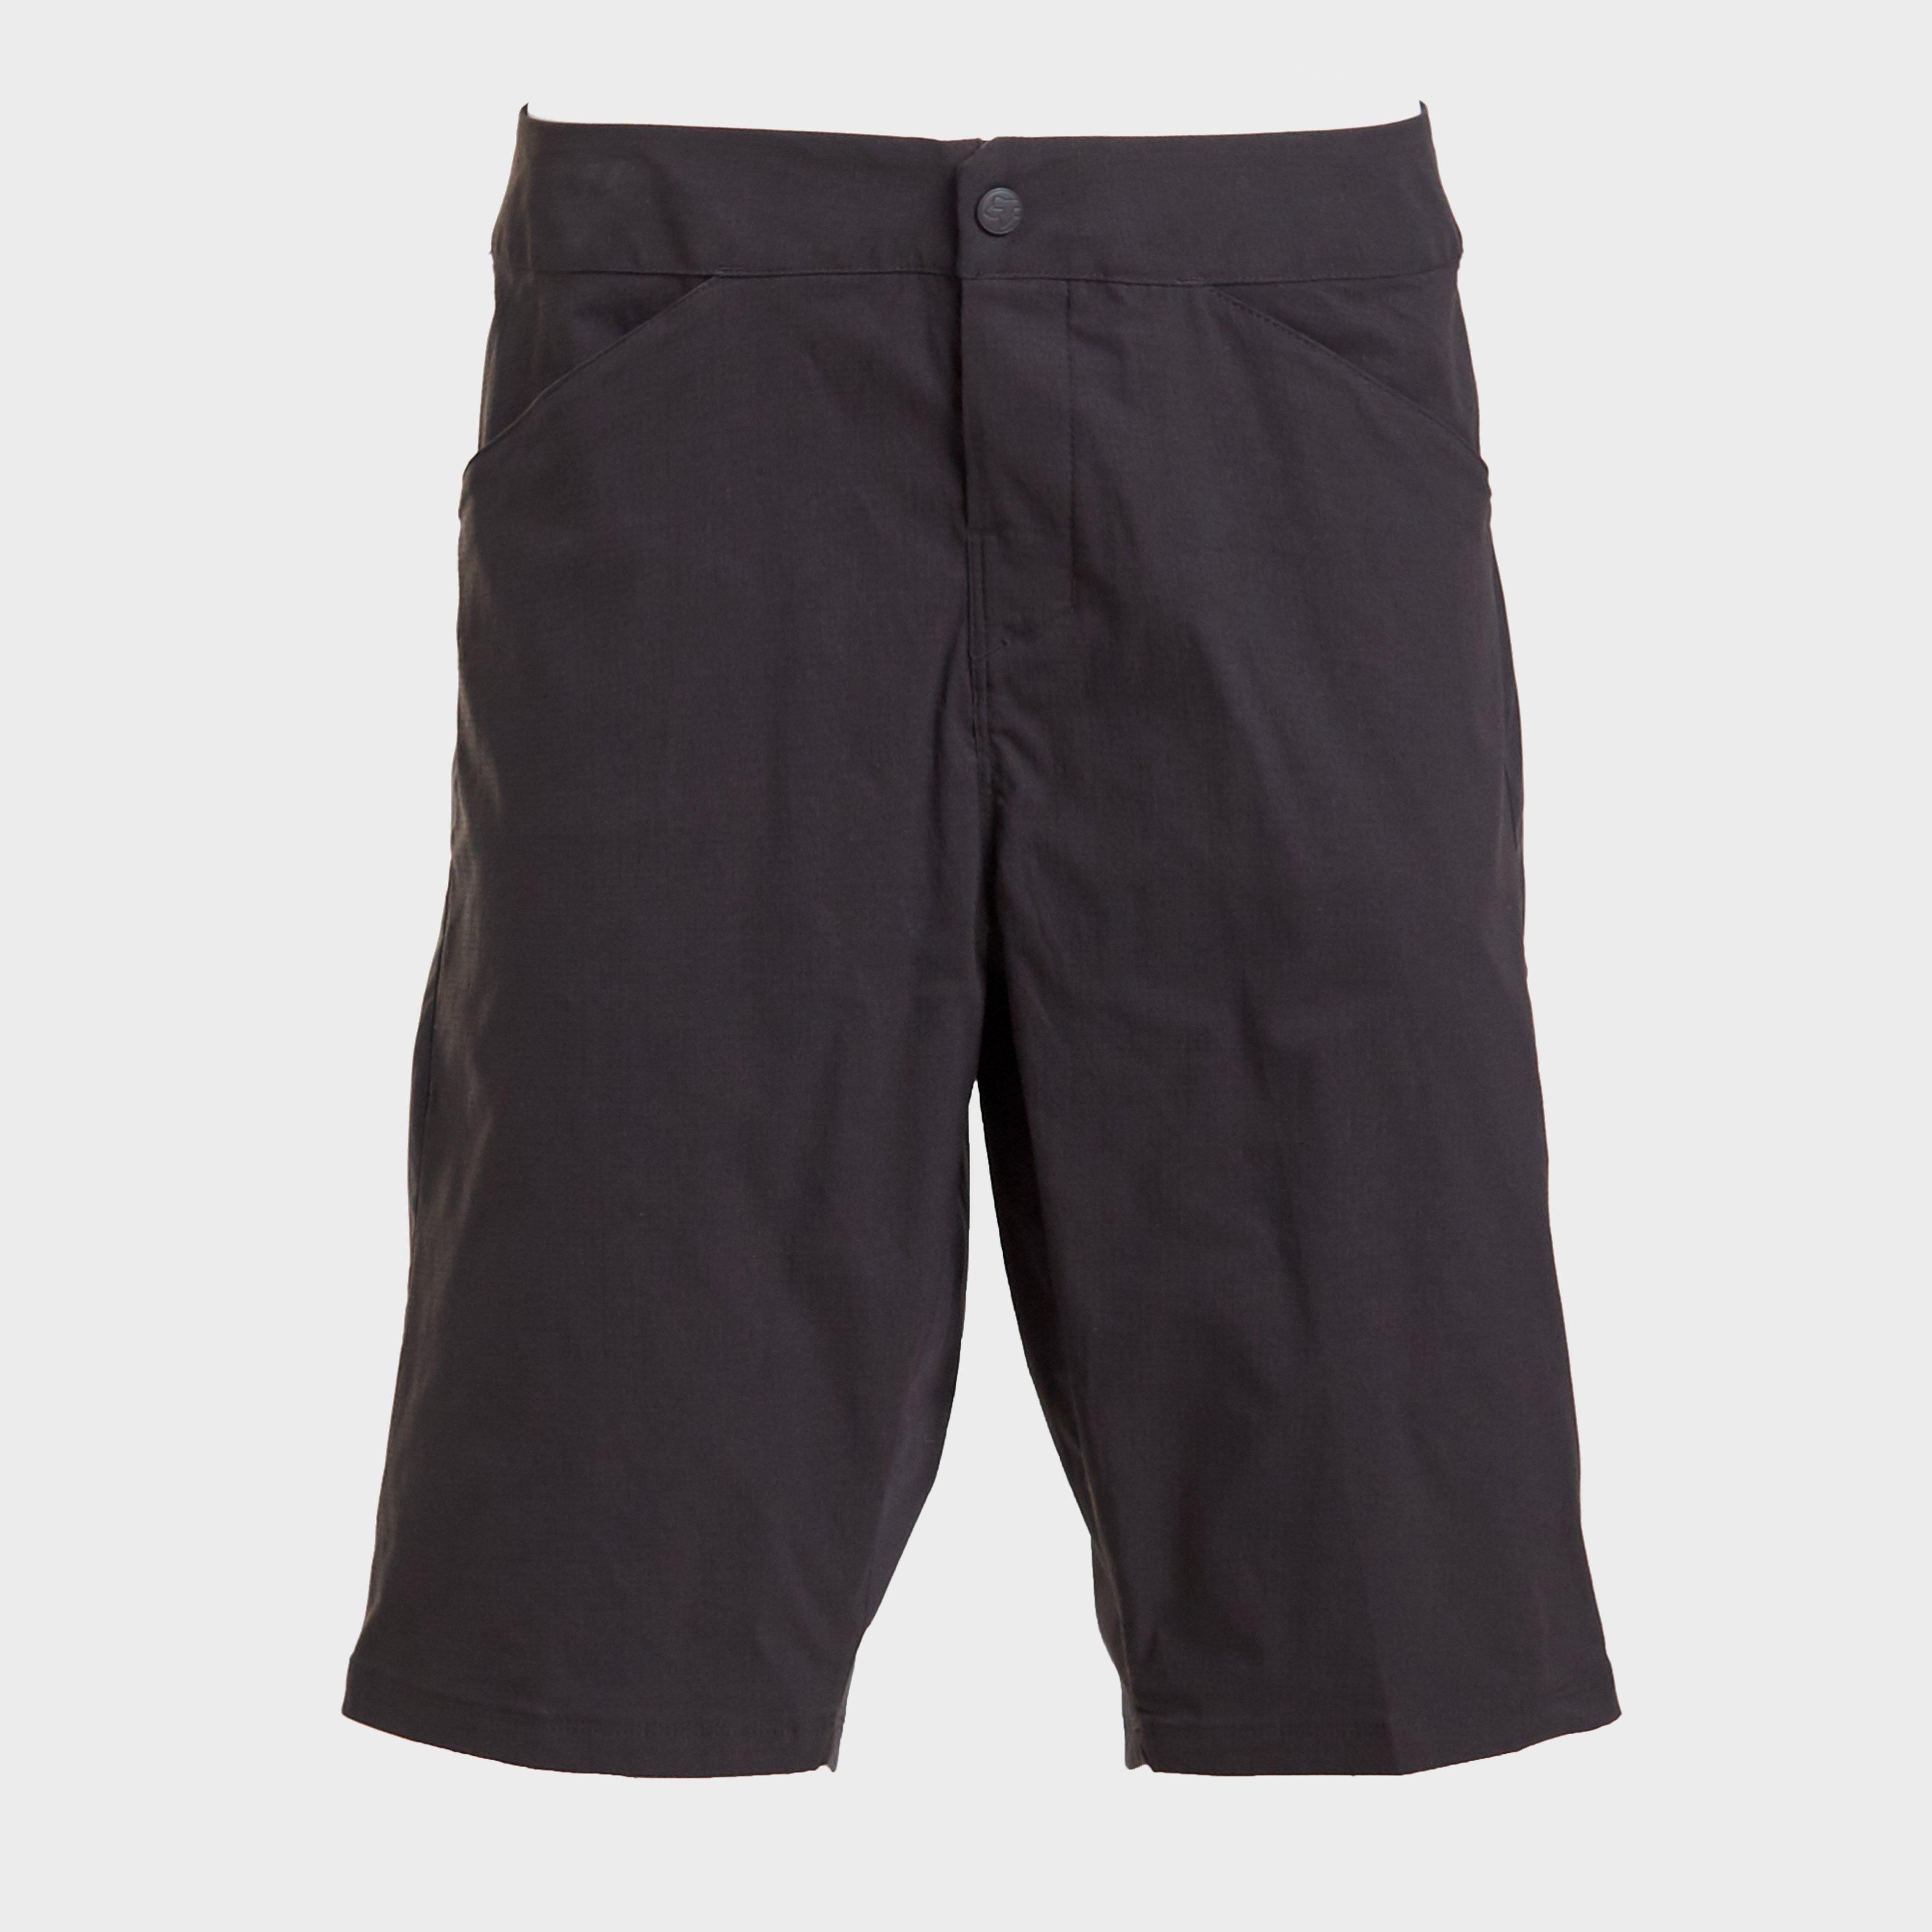 FOX Fox Mens Ranger Water Resistant Shorts, Black